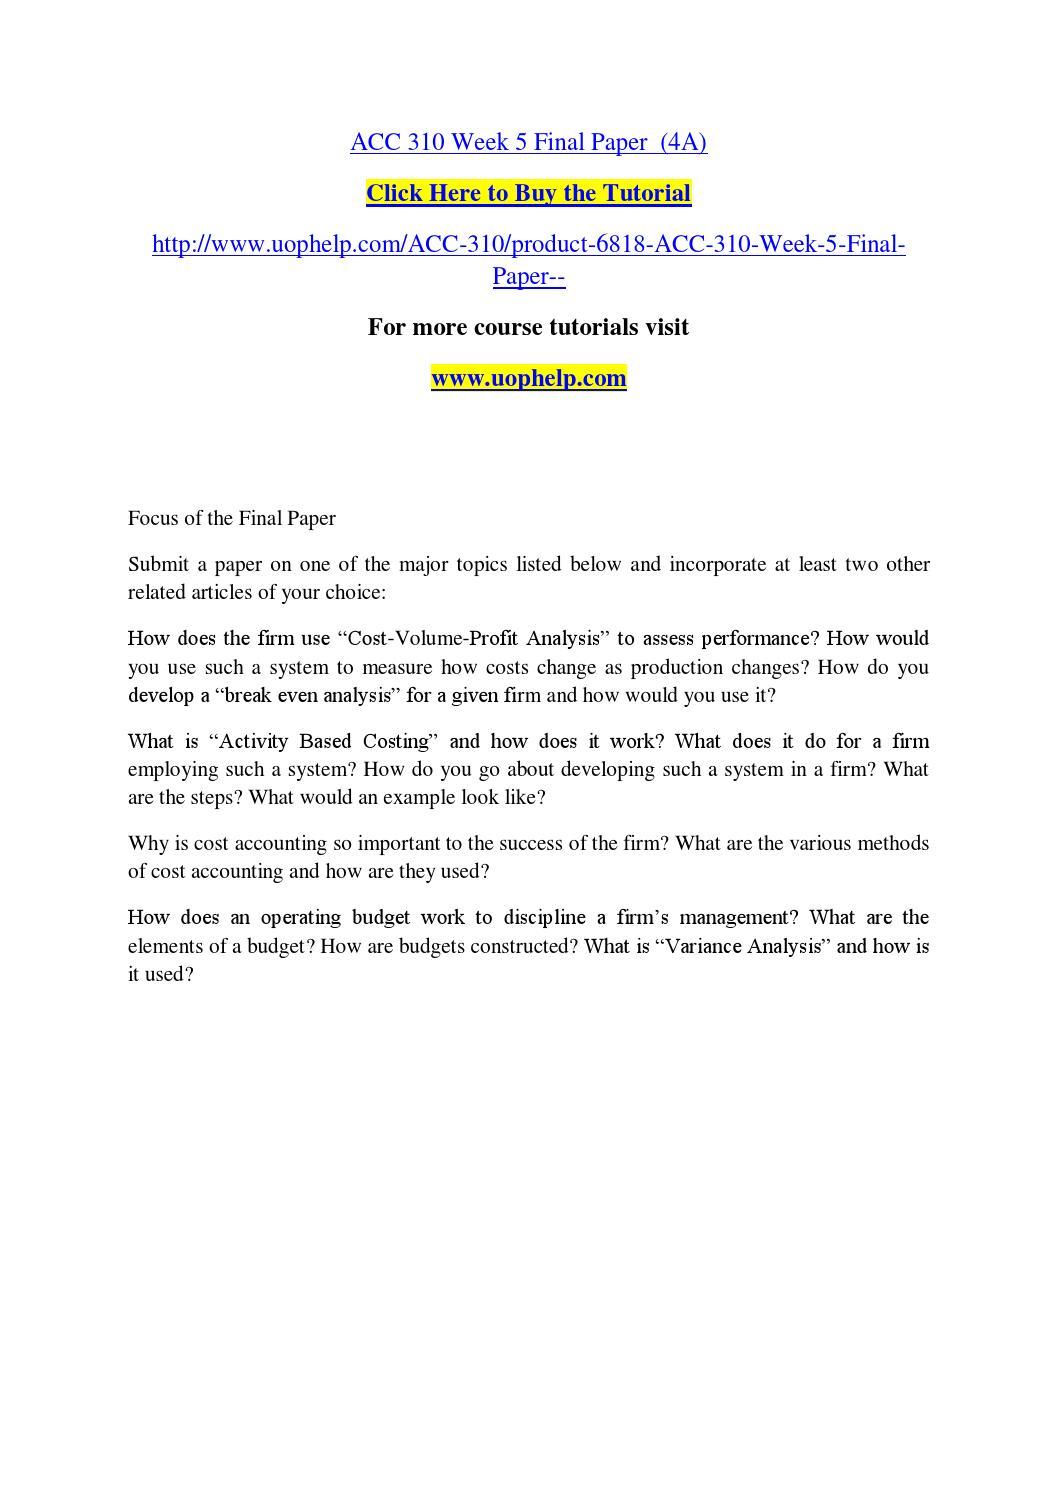 Acc 310 week 5 final paper (4a) by Zxcvcbv - issuu